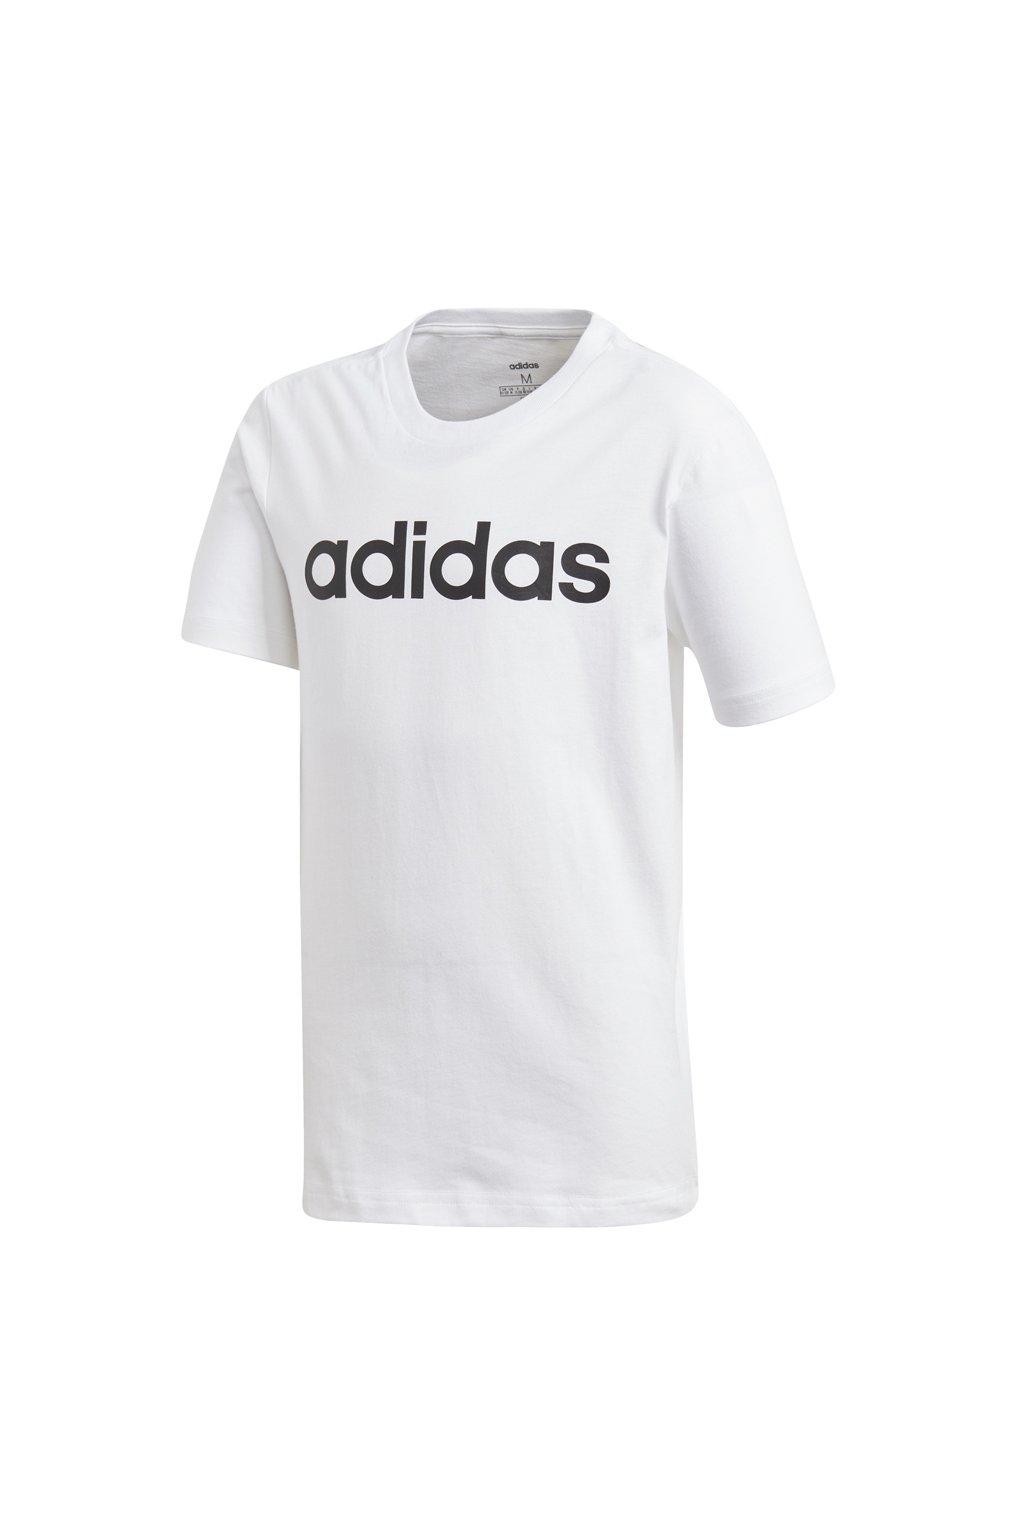 Chlapčenské tričko Adidas Essentials Linear Tee Junior biele DV1810